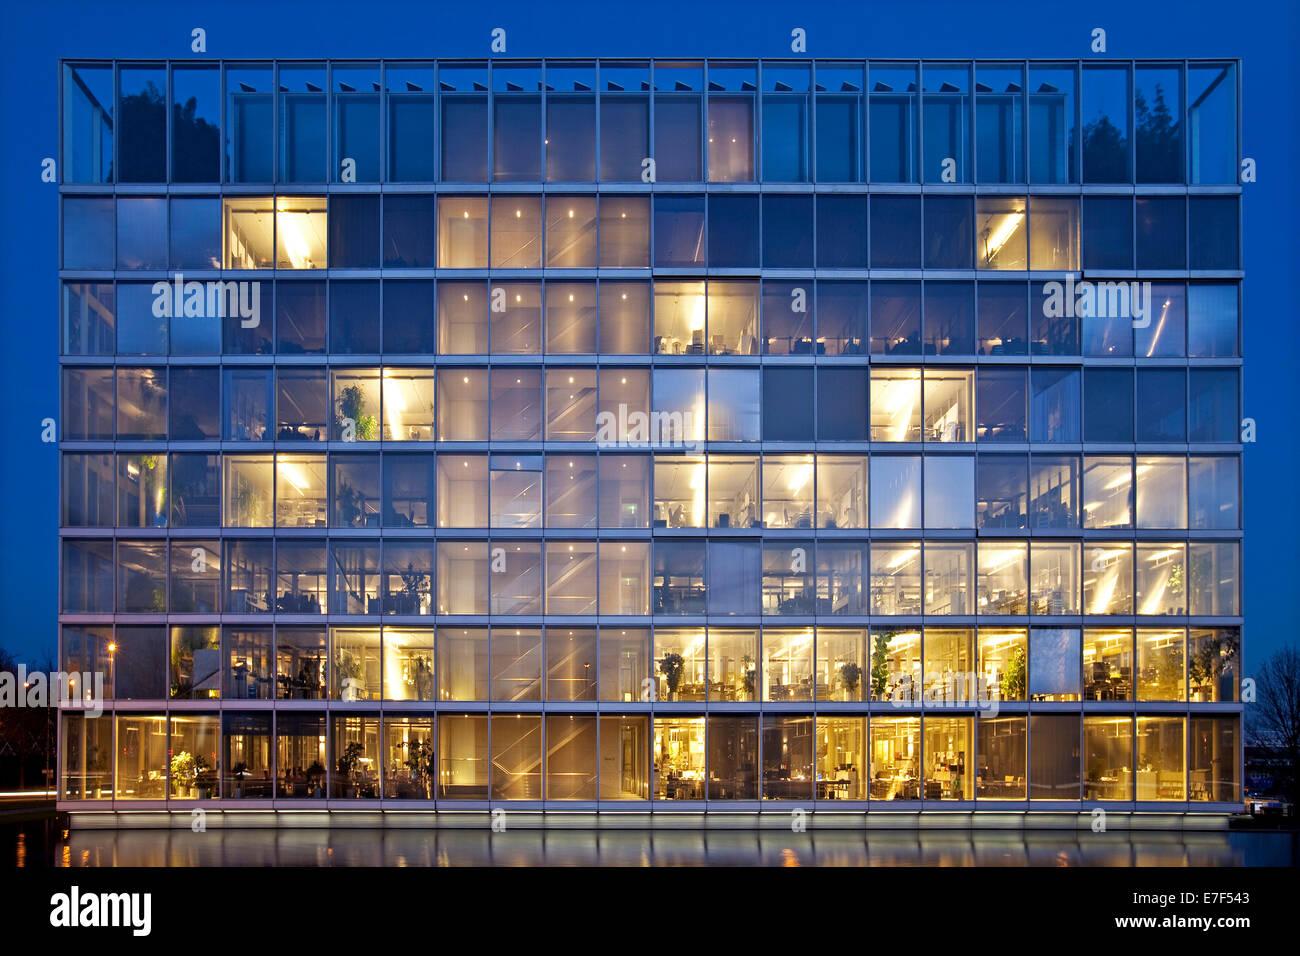 Headquarters of Gelsenwasser AG, utilities company, Gelsenkirchen, Ruhr Area, North Rhine-Westphalia, Germany - Stock Image